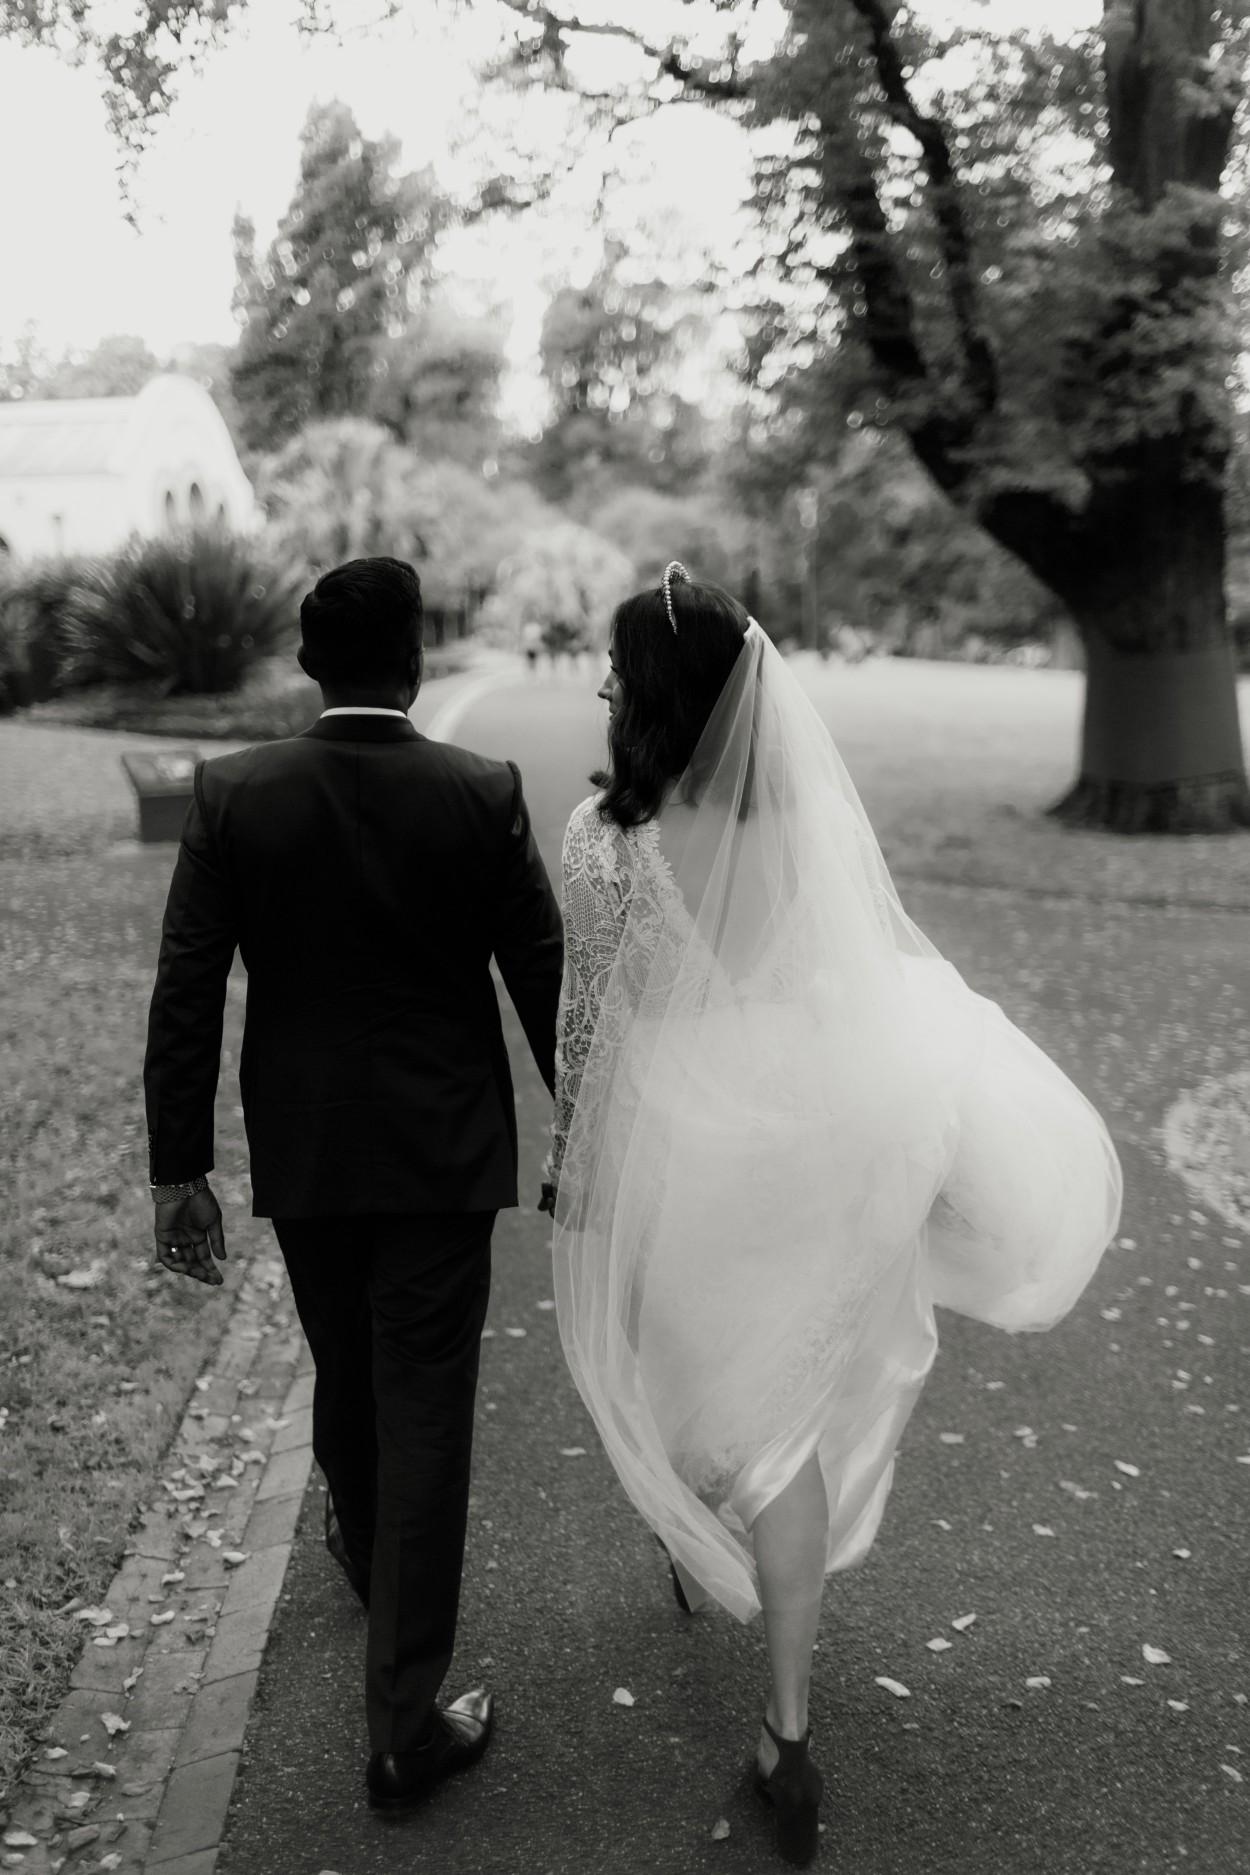 I-Got-You-Babe-Weddings-The-055George-Ballroom-St-Kilda-Wedding-Amy-Abhi.jpg